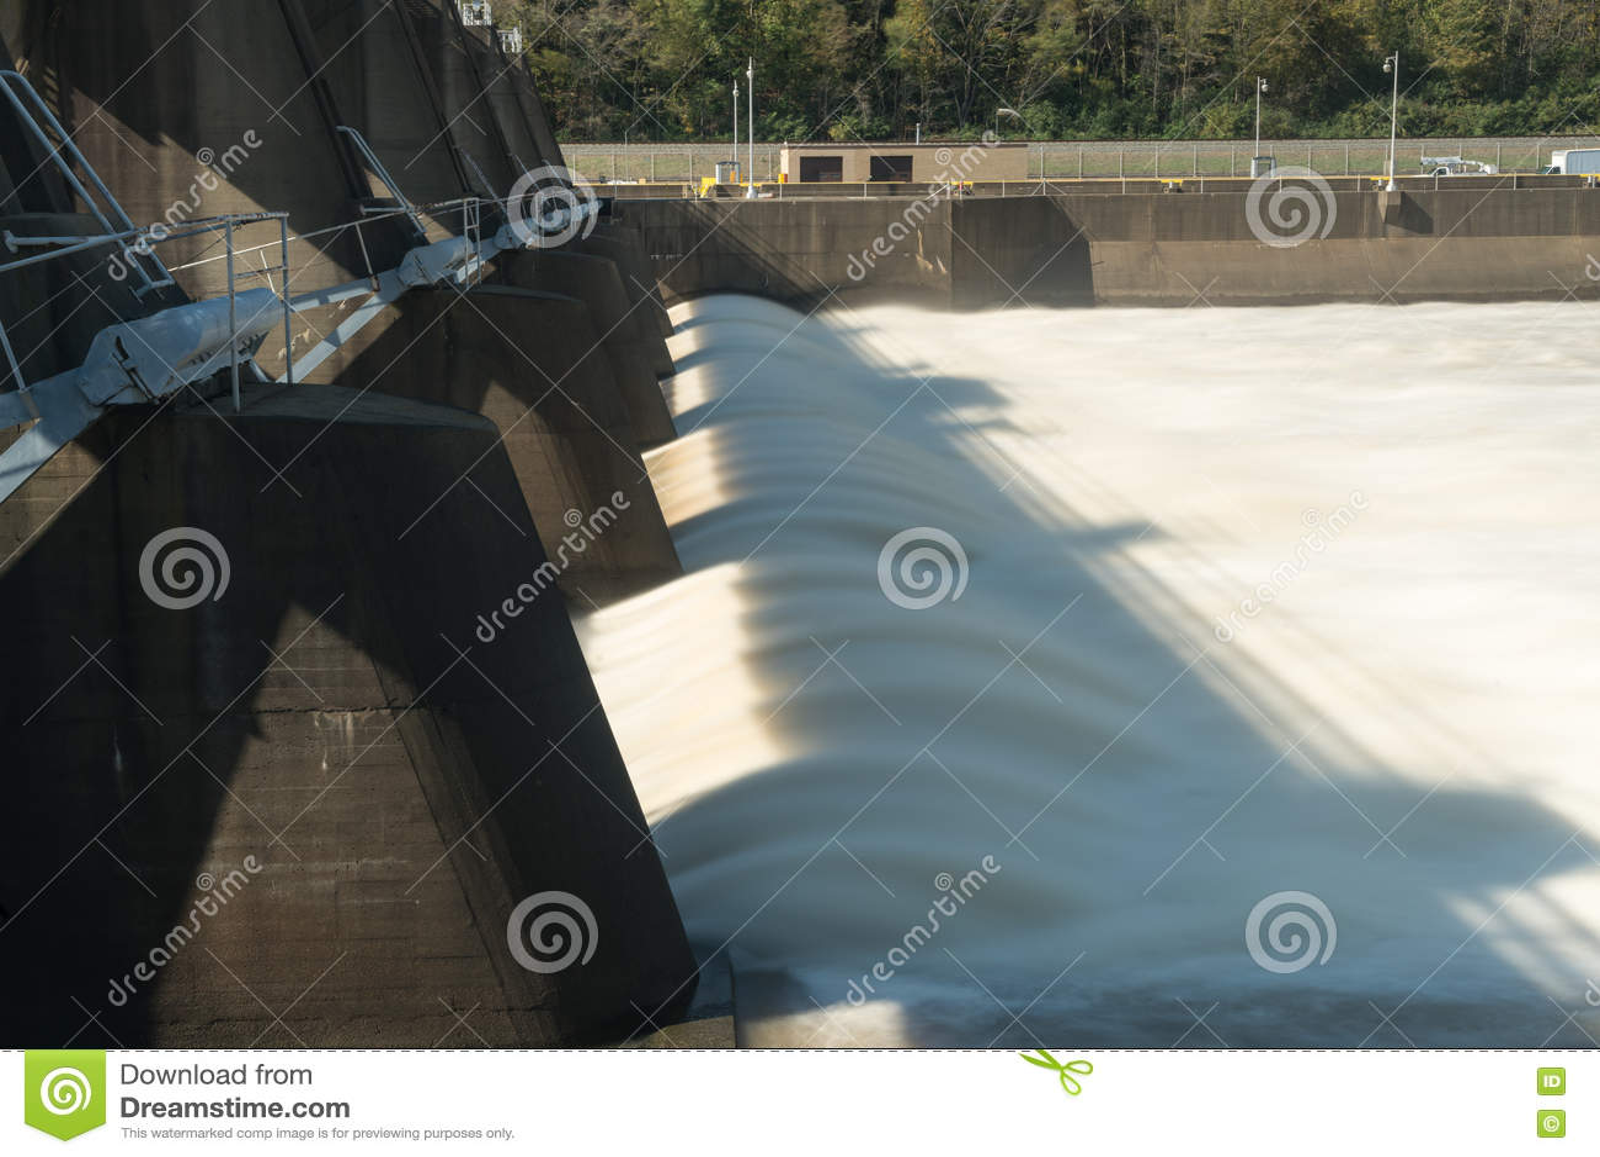 摩根敦锁和水坝在河Monongahela